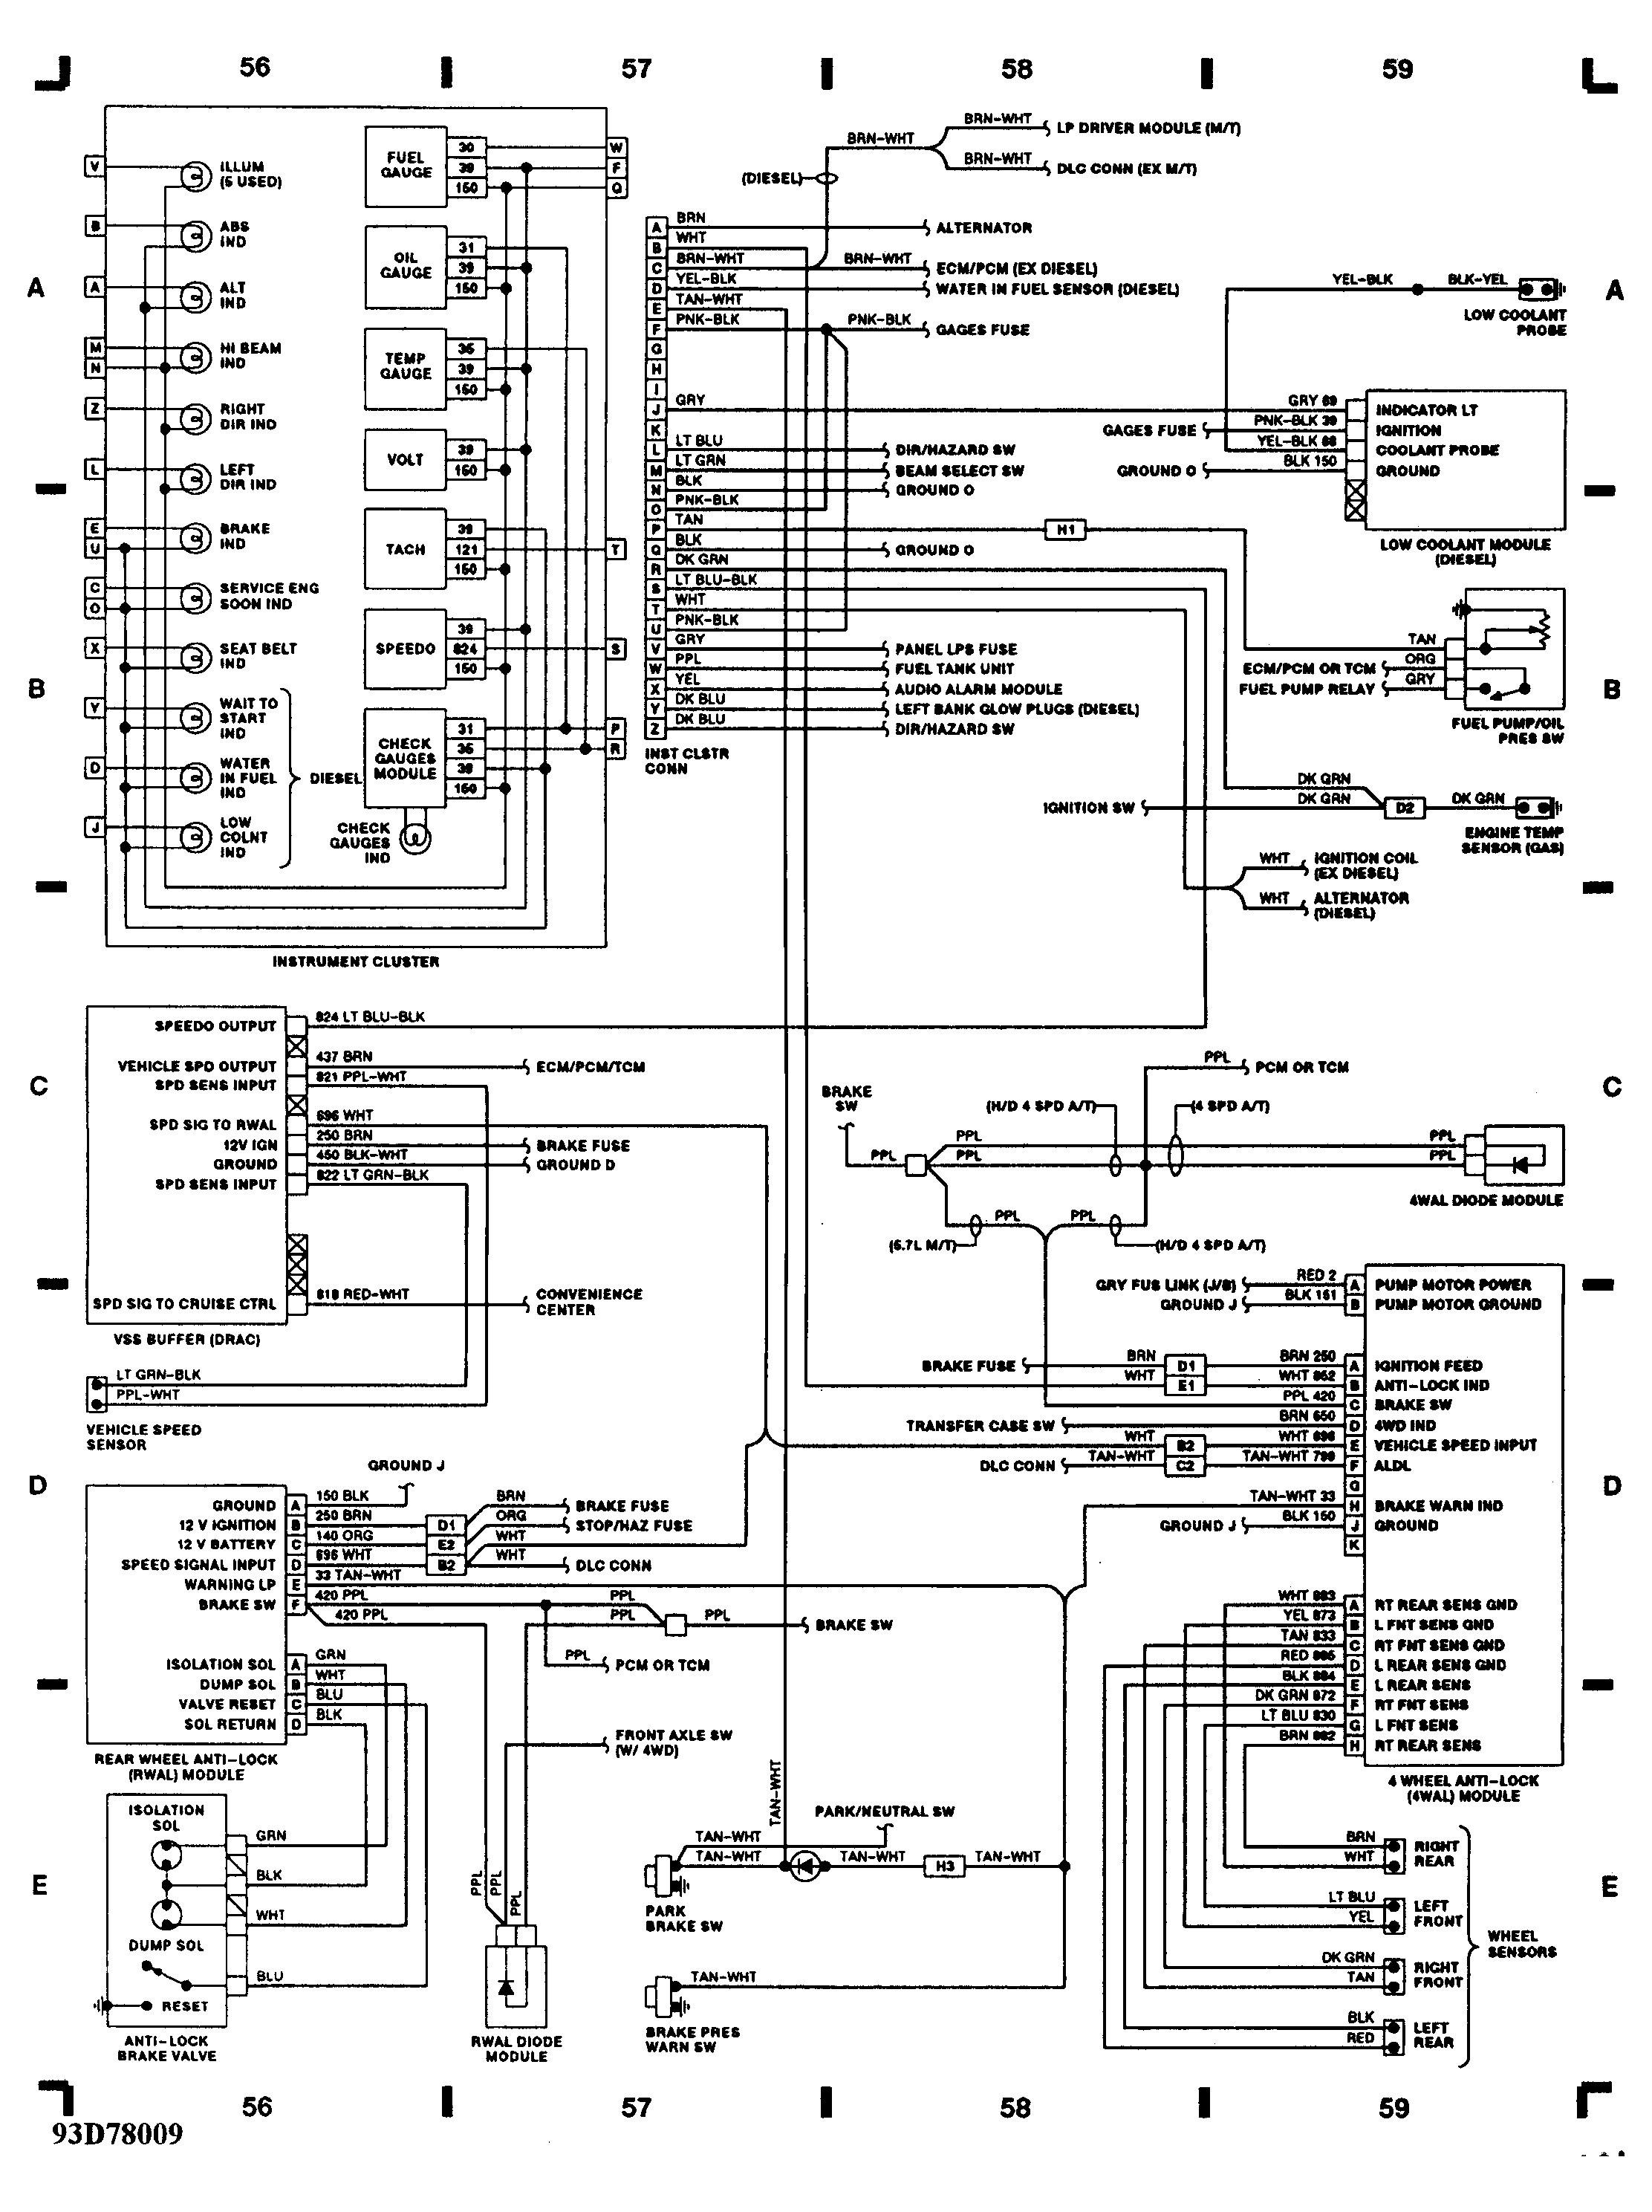 2000 Chevy Silverado Engine Diagram Elegant 1993 Chevy Silverado Wiring Diagram Diagram Of 2000 Chevy Silverado Engine Diagram